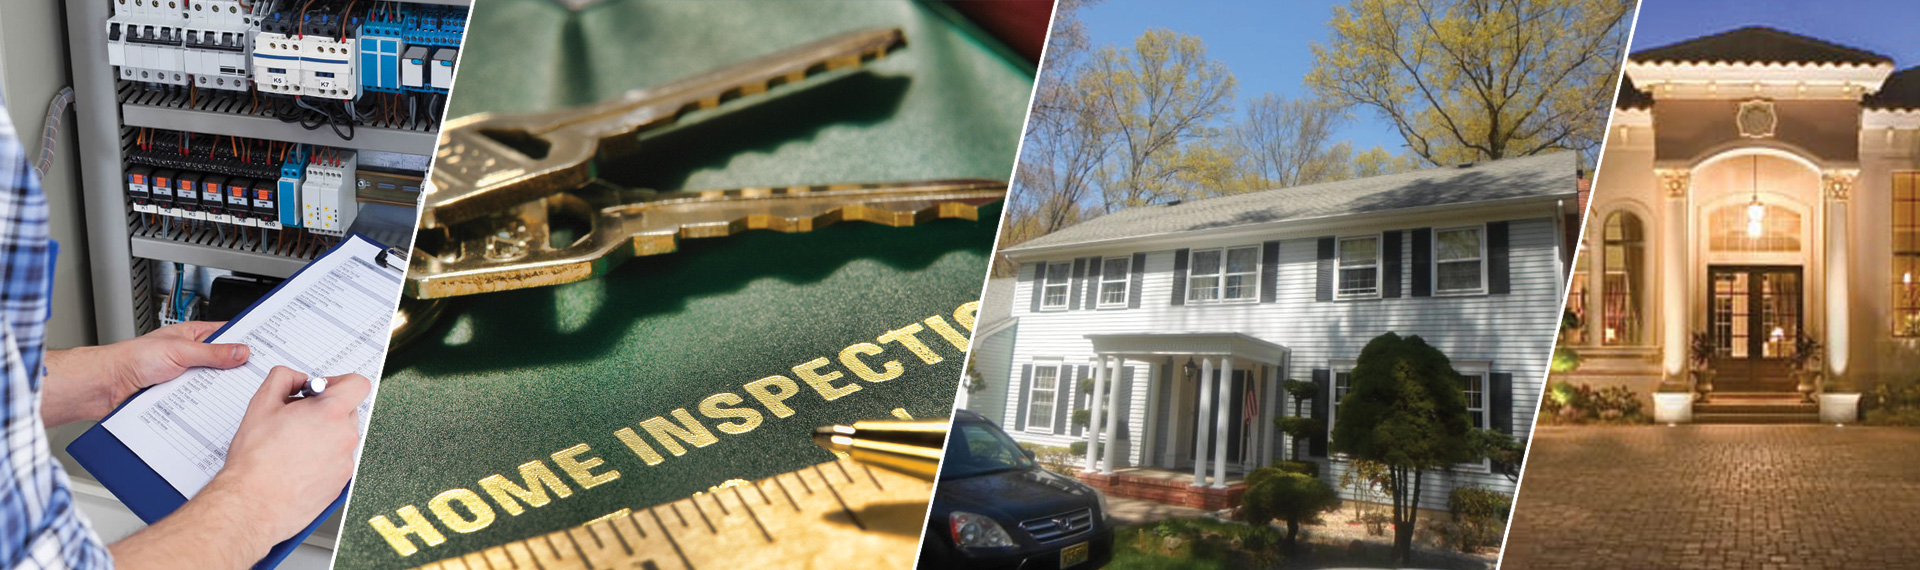 AAA House Doctors Engineers & Home Inspectors New Brunswick NJ